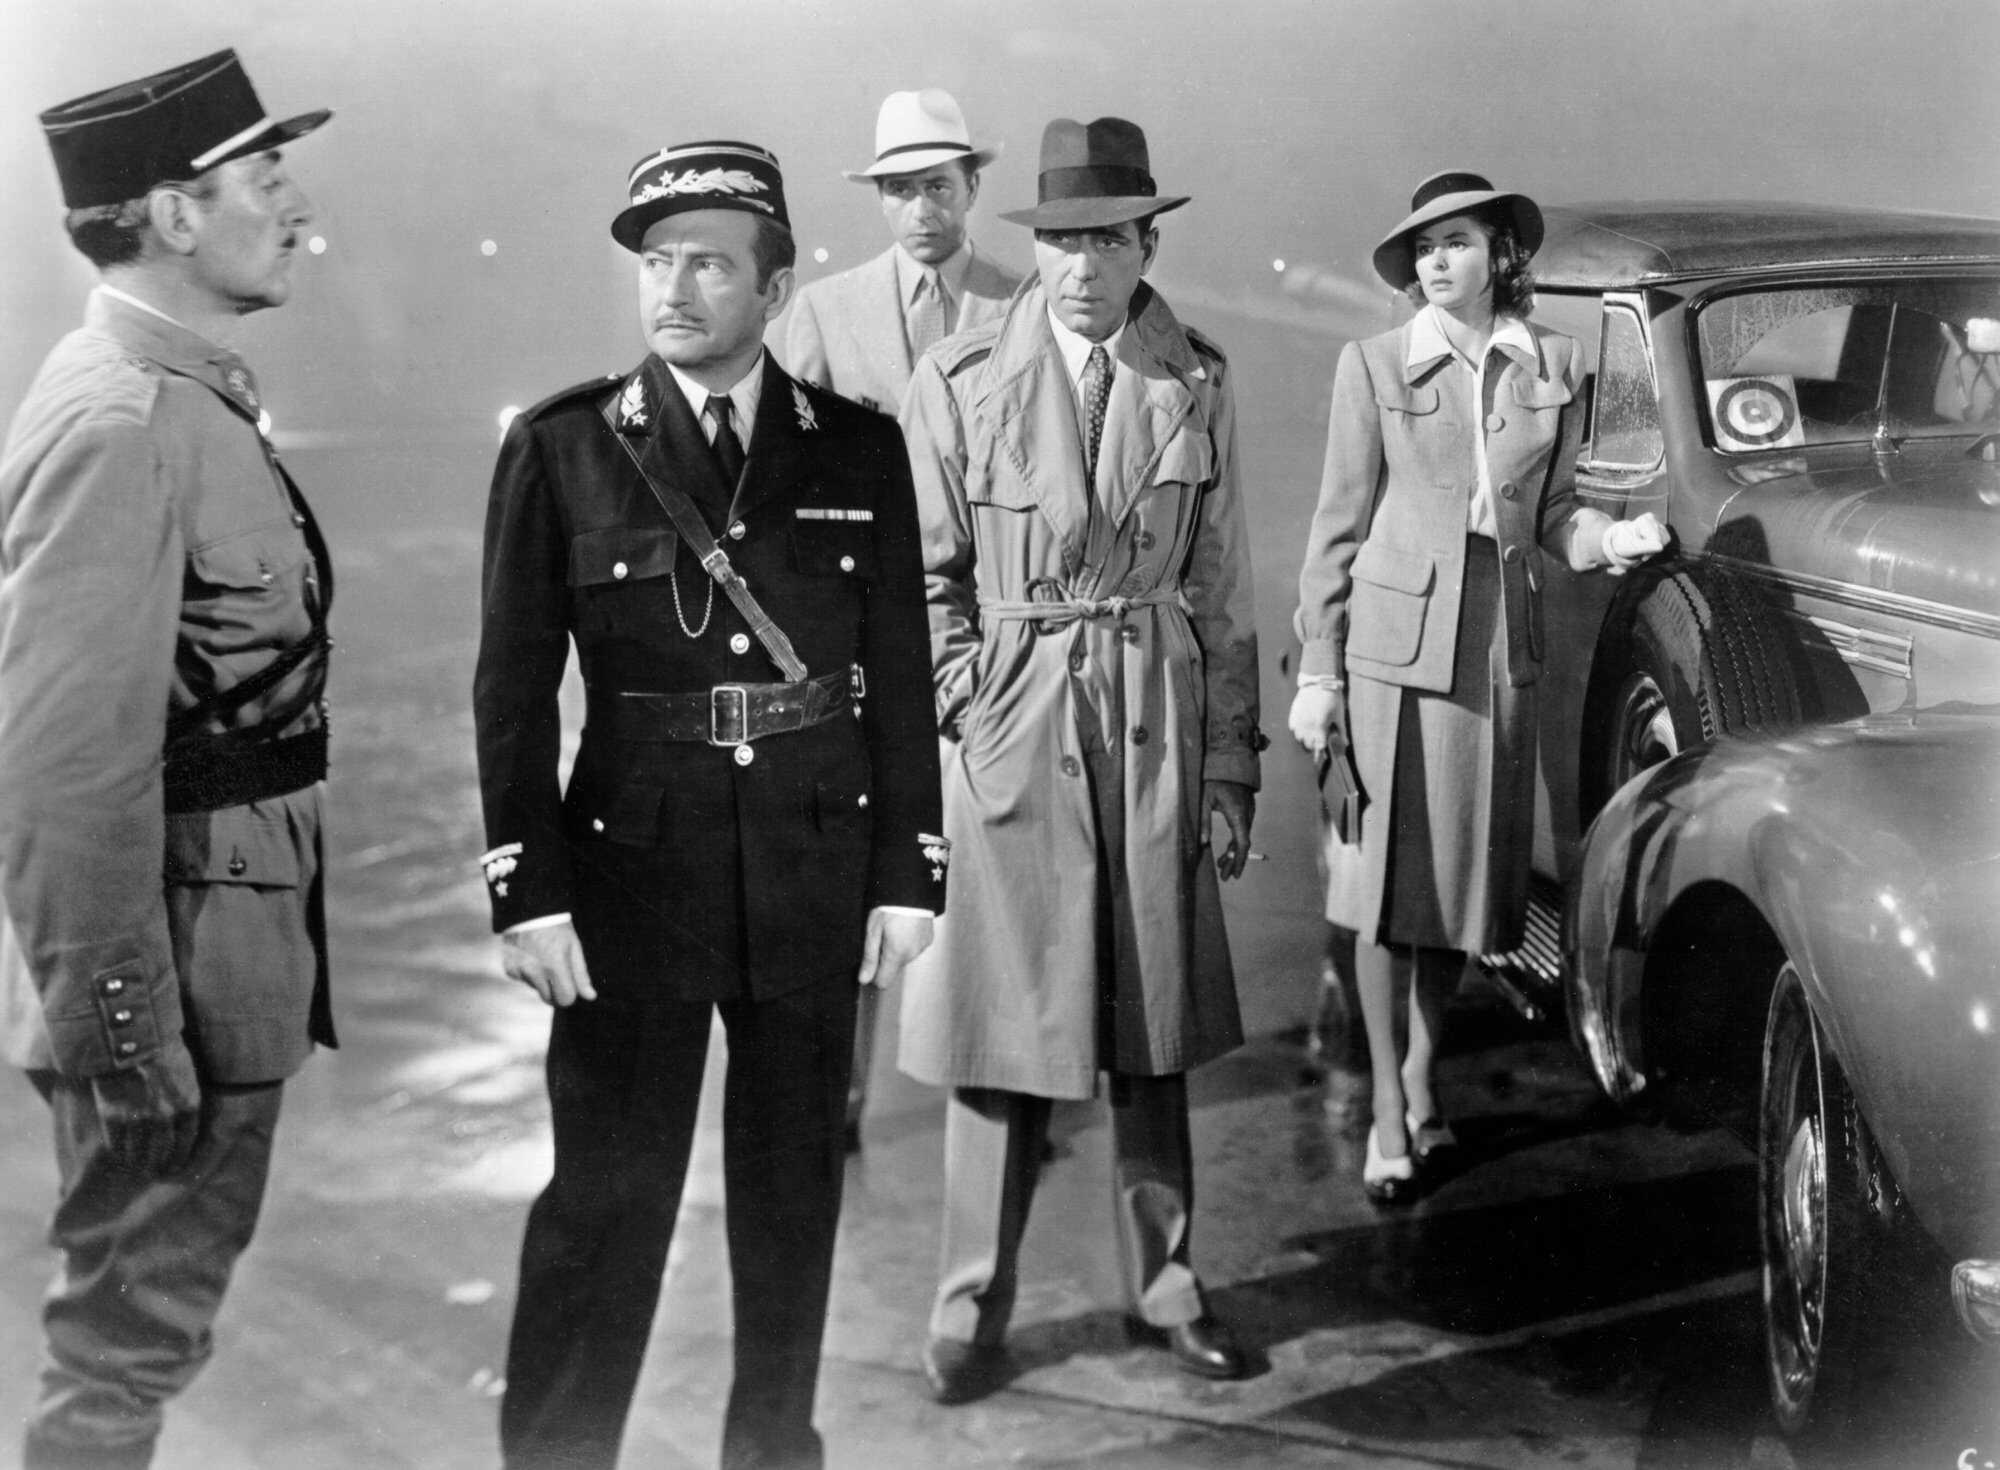 Casablanca-scene-2-GettyImages-74254526_master.jpg